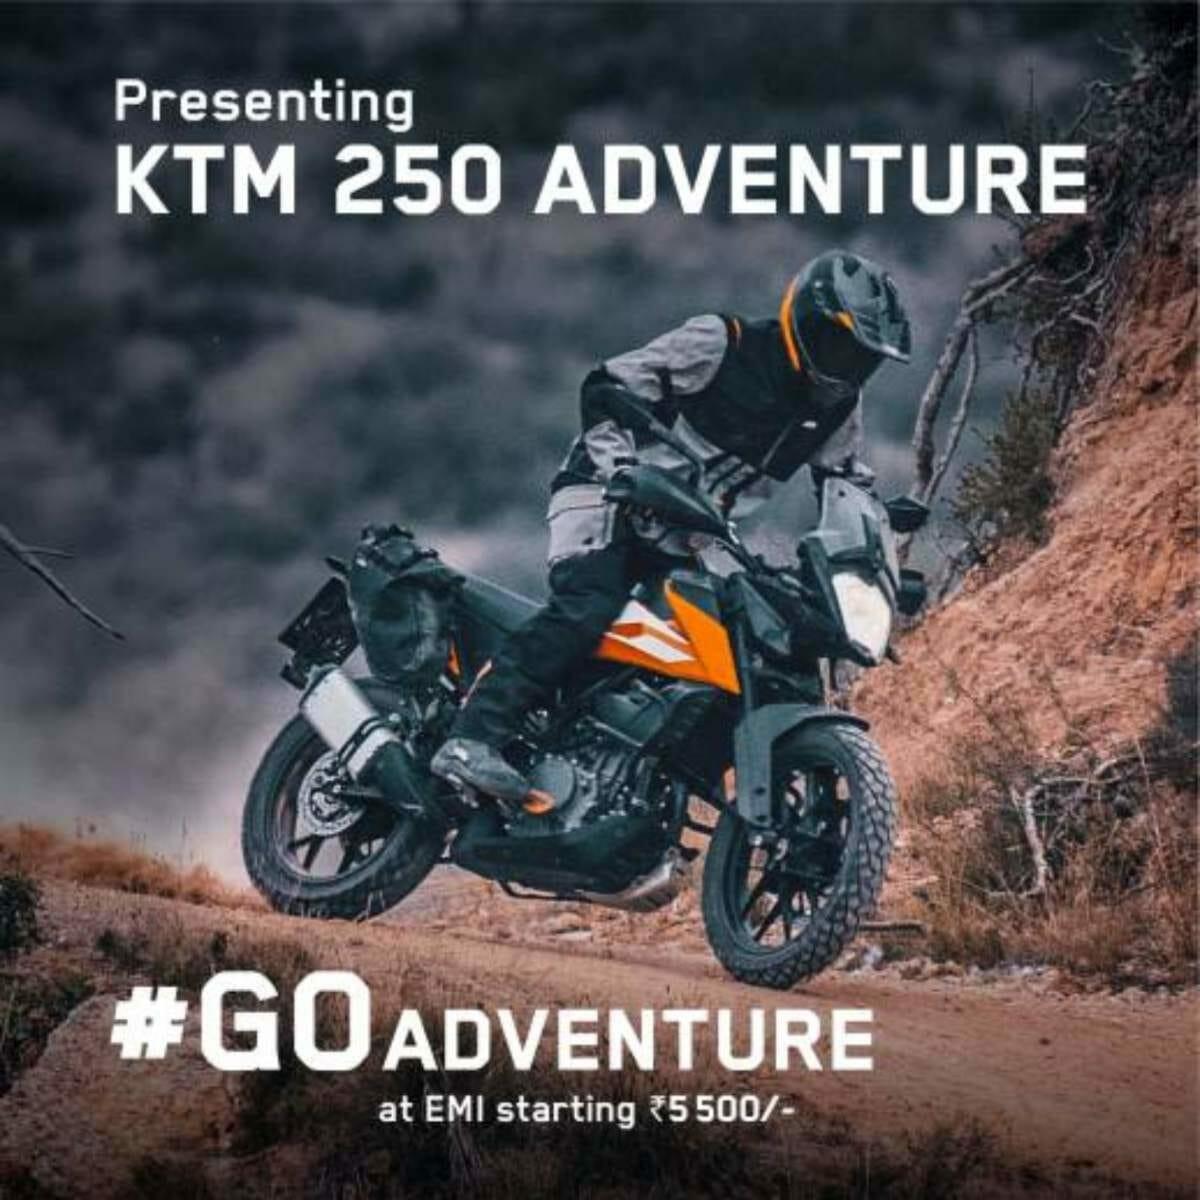 KTM 250 Adventure launched (3)